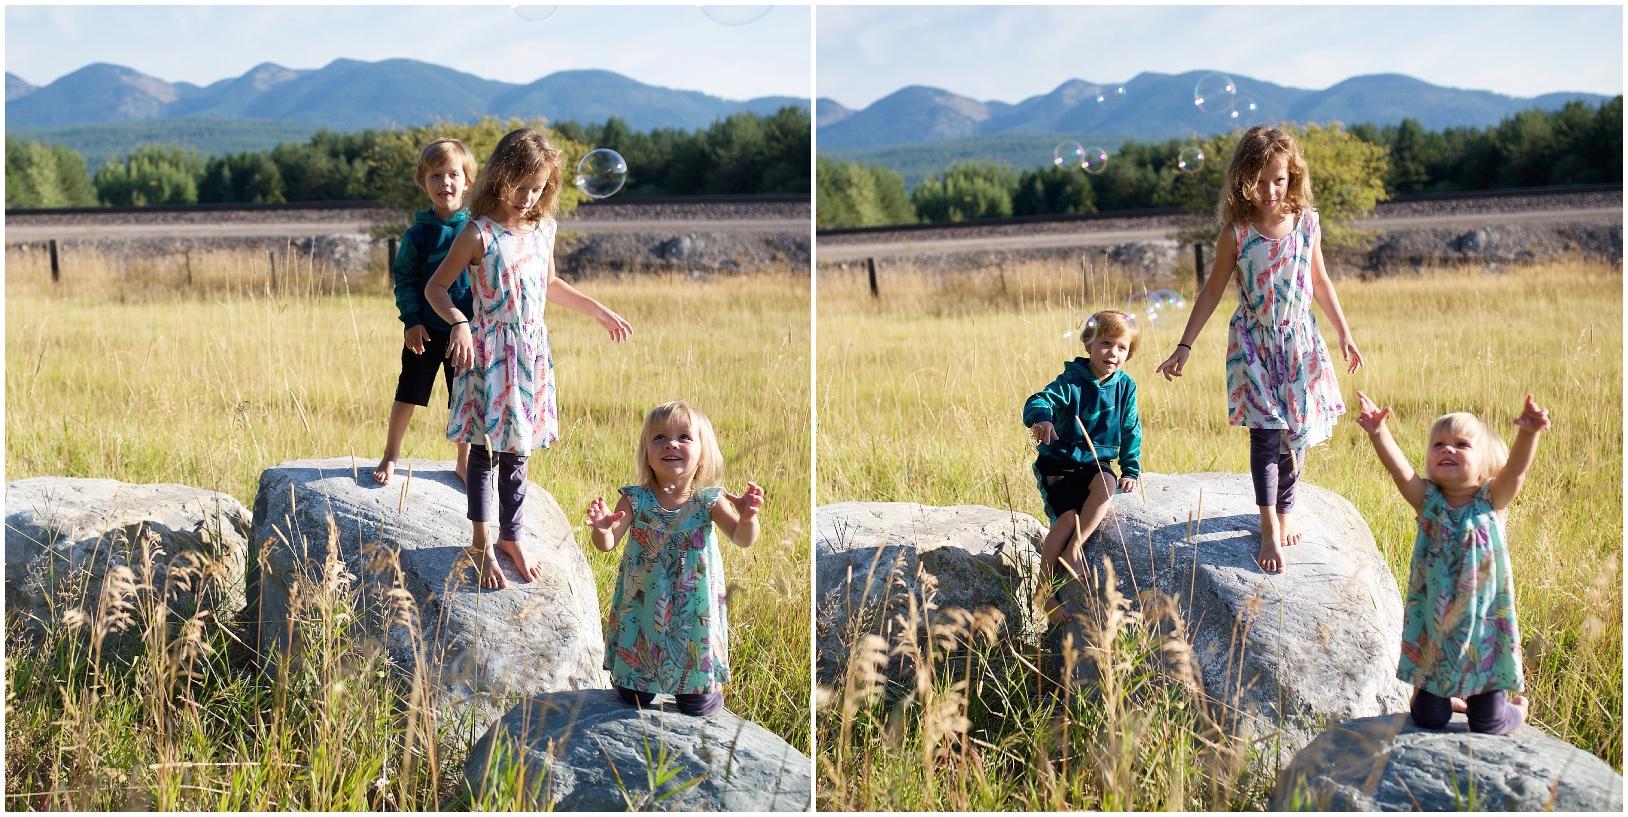 lindseyjane_kids026.jpg